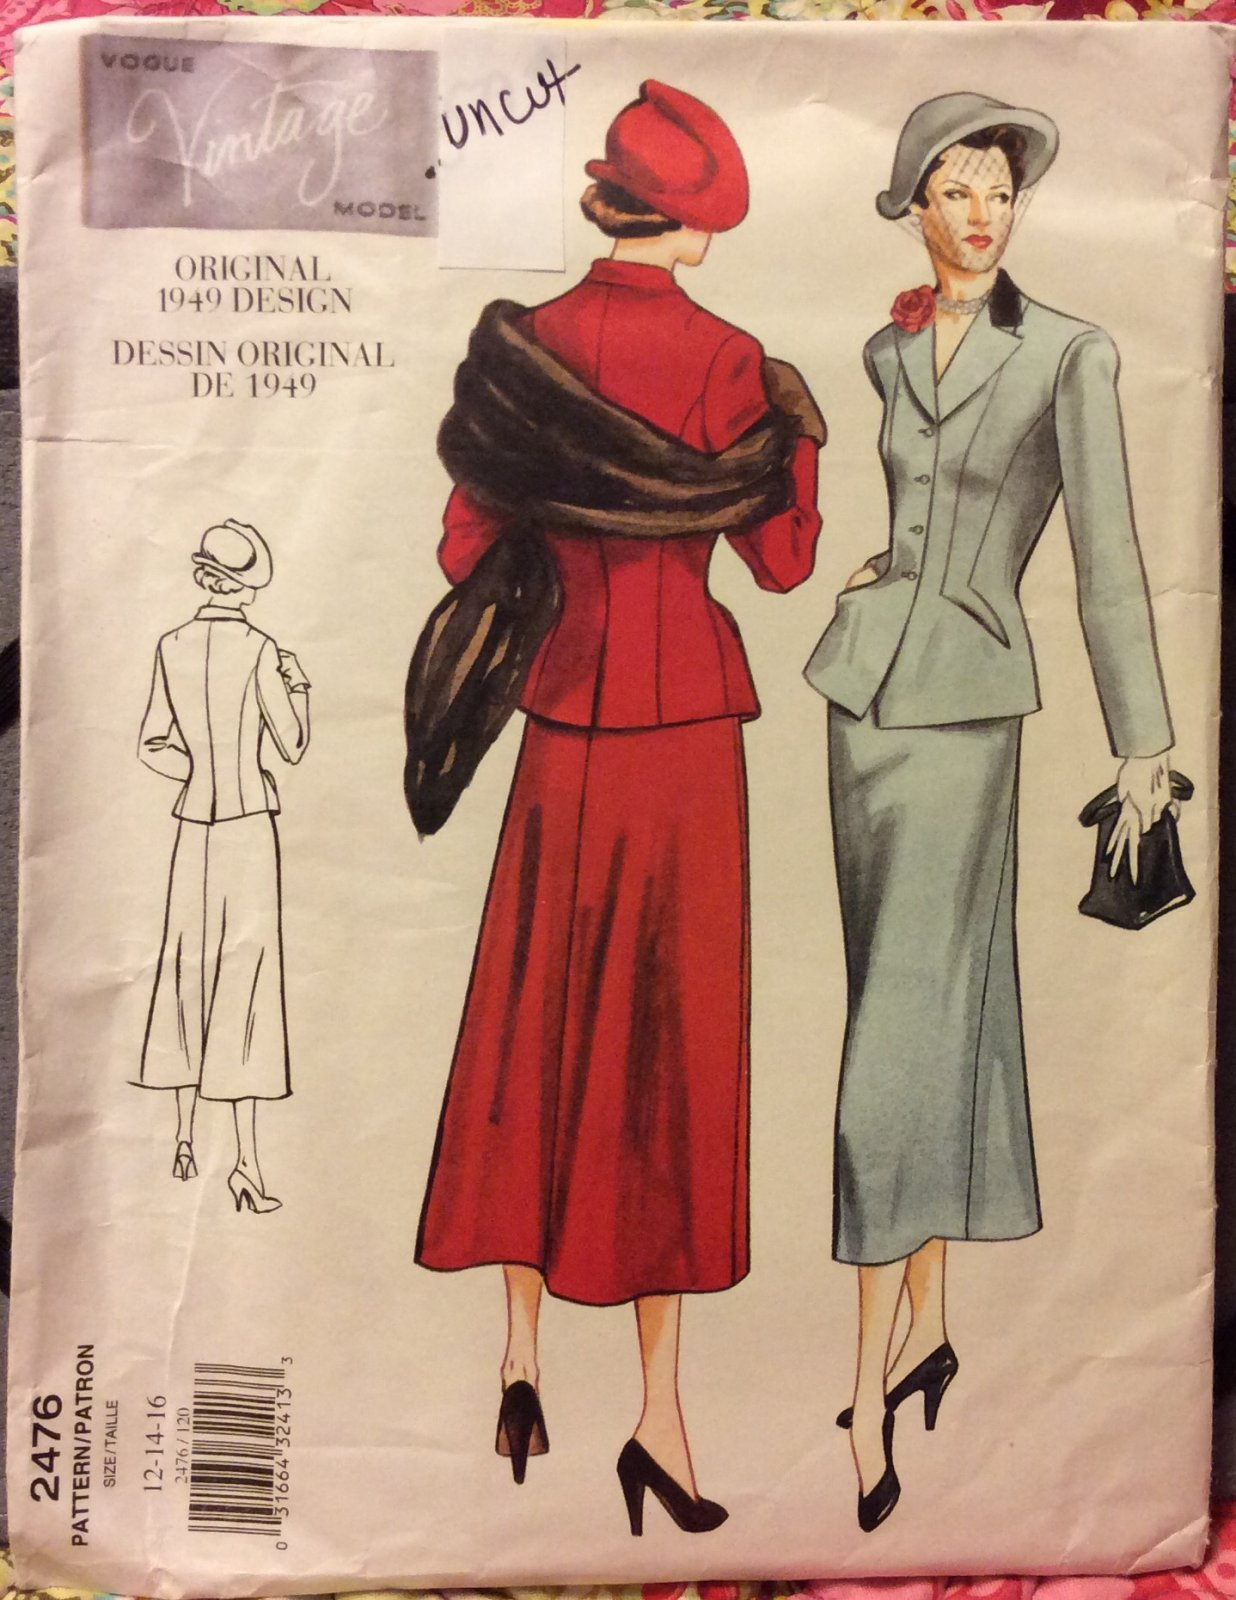 VINTAGE VOGUE #2476 VINTAGE Model Original 1949 Design Classic Suit Jacket and Skirt SEWING PATTERN Size 12 14 16 UNCUT VSB19